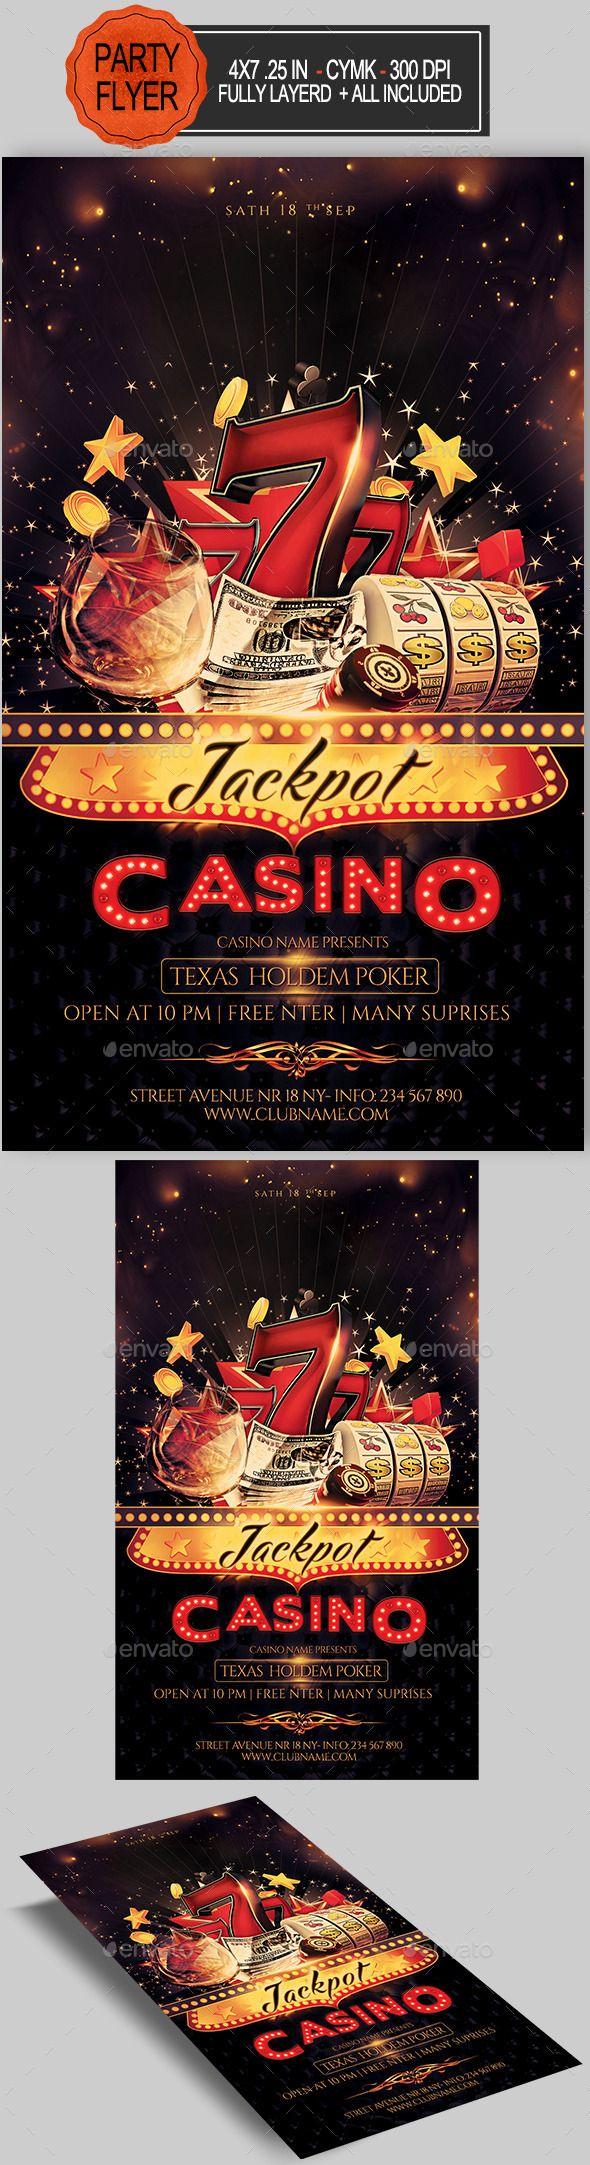 Casino Flyer - Clubs...